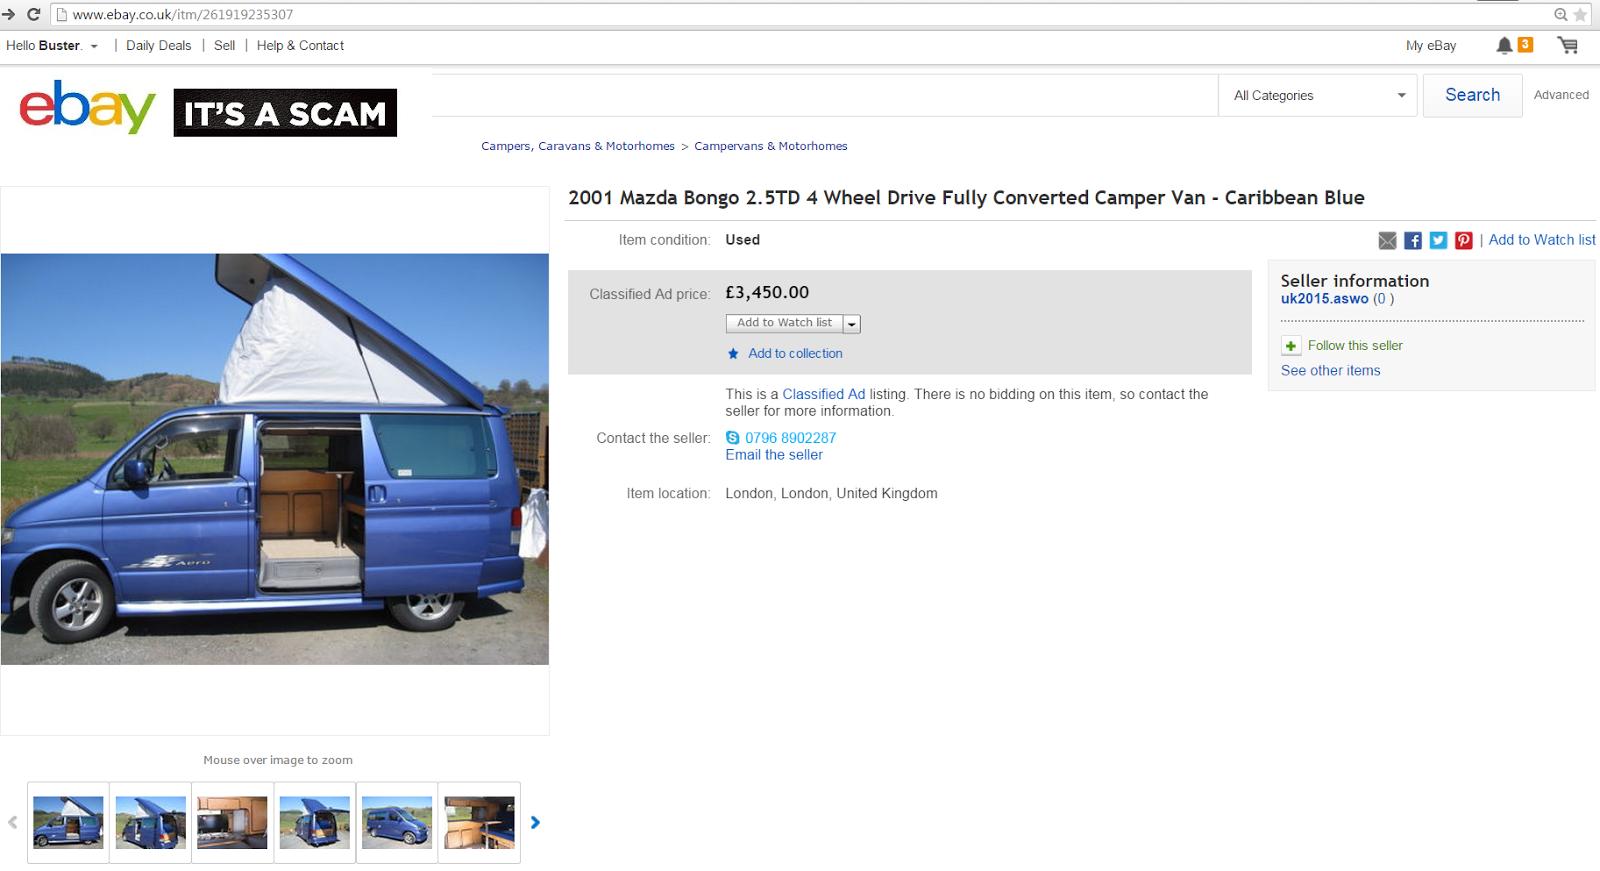 EBAY SCAM : 2001 Mazda Bongo Camper Van | VF51ATZ - Fraud - VF51 ATZ ...